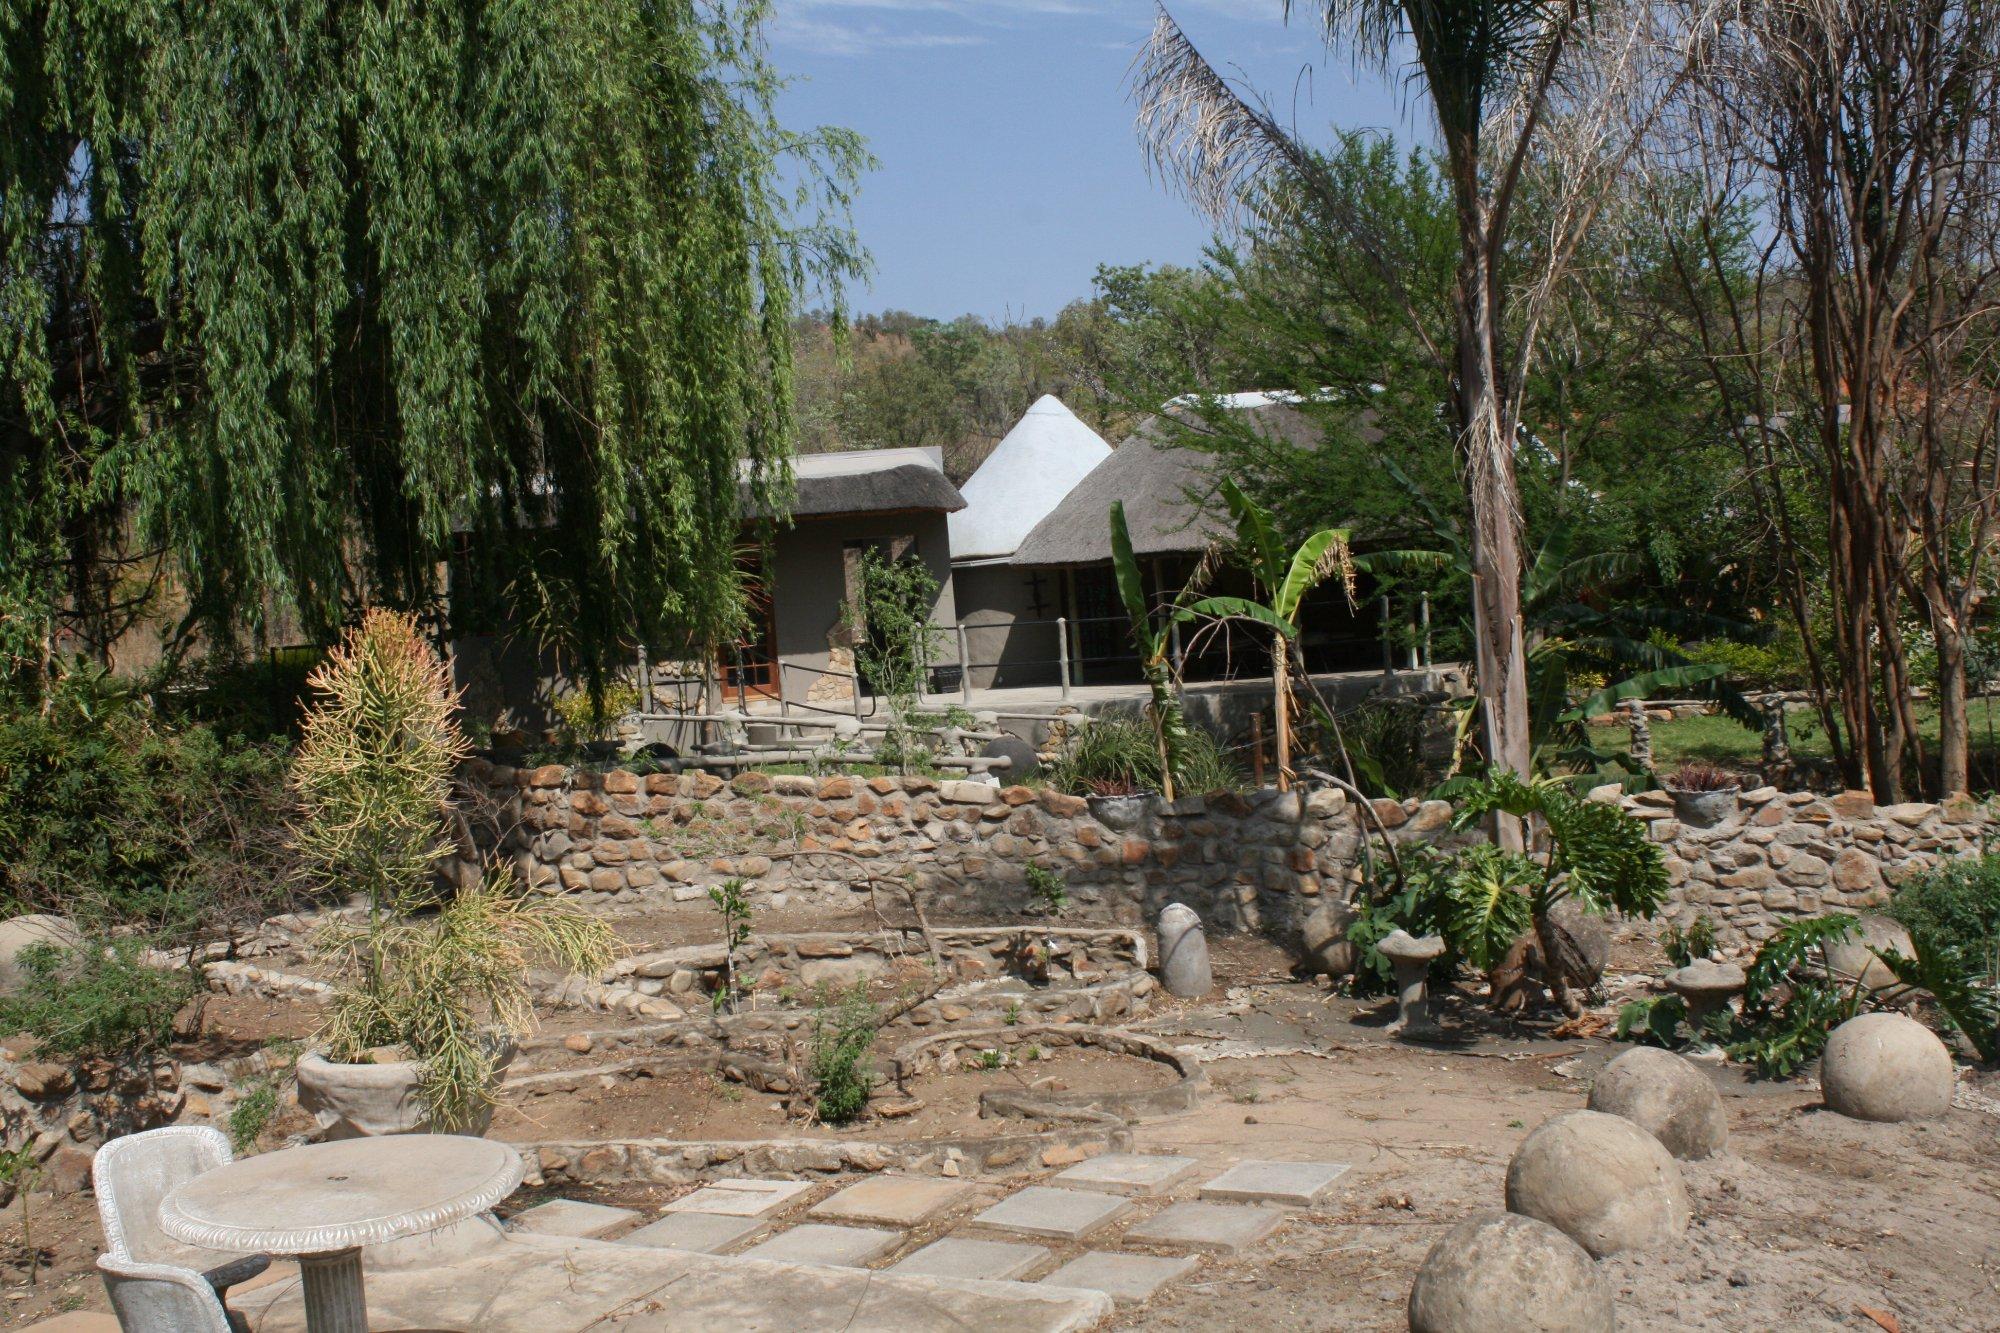 Oude Landgoed Lodge and Spa